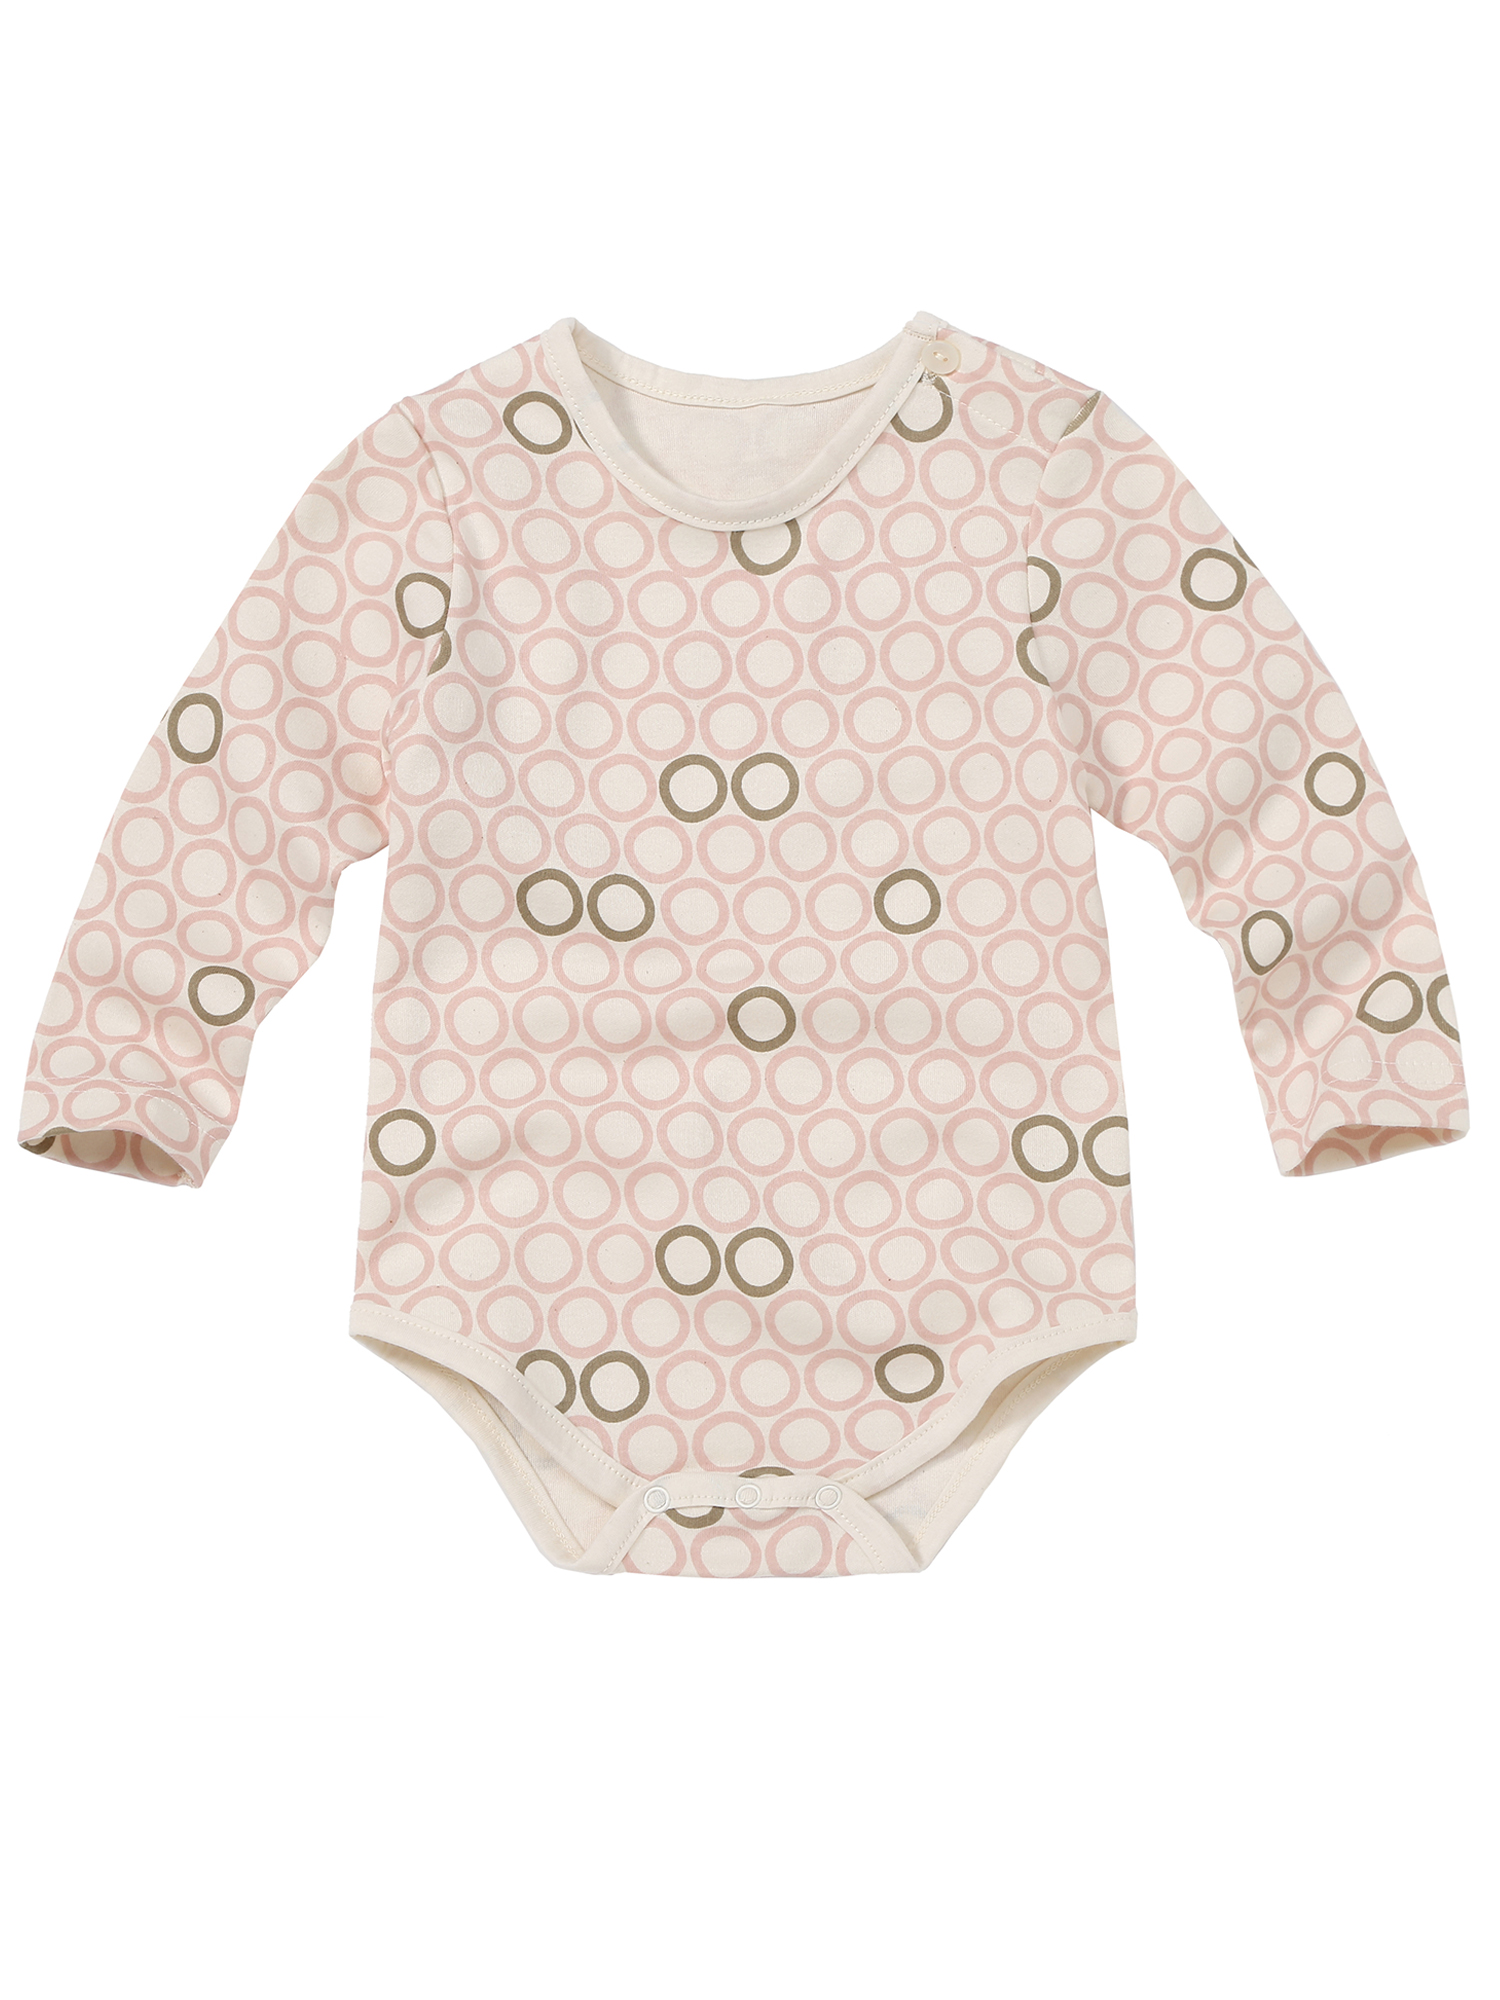 New Premium Cotton Infant Baby Toddler Unisex Long Sleeve Snap Closure Bodysuits